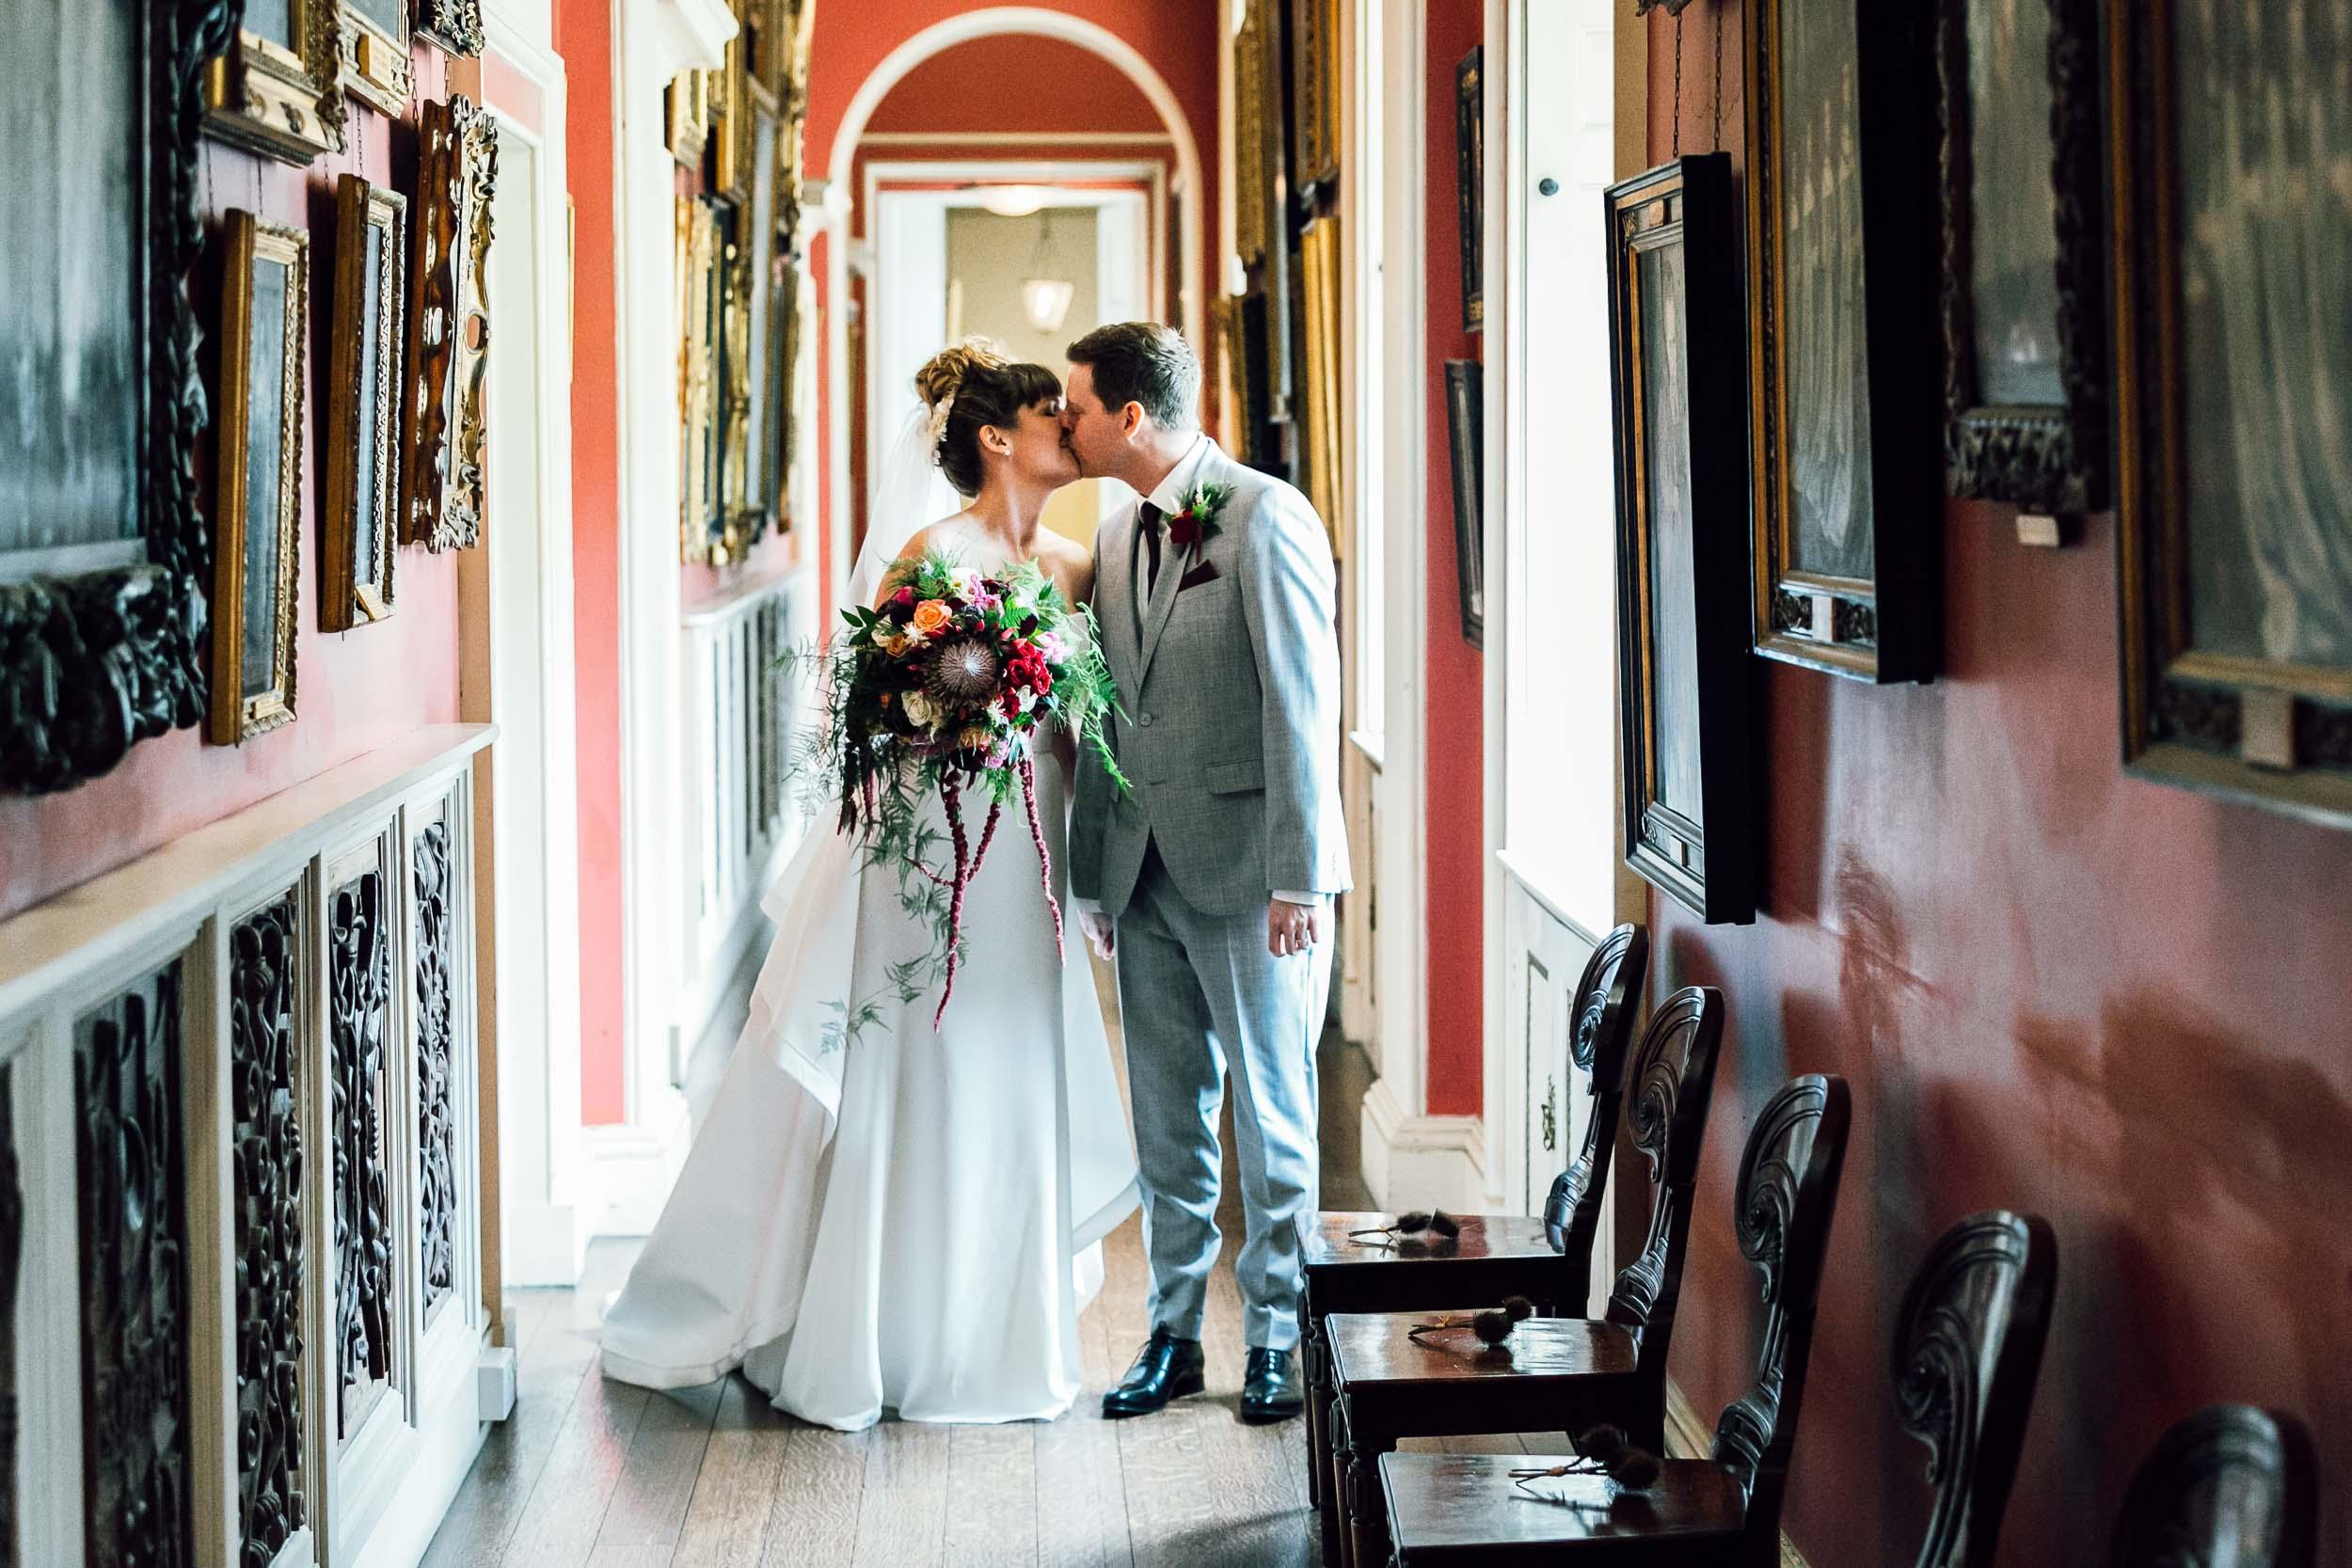 syon-house-wedding-photographer-london 075.jpg